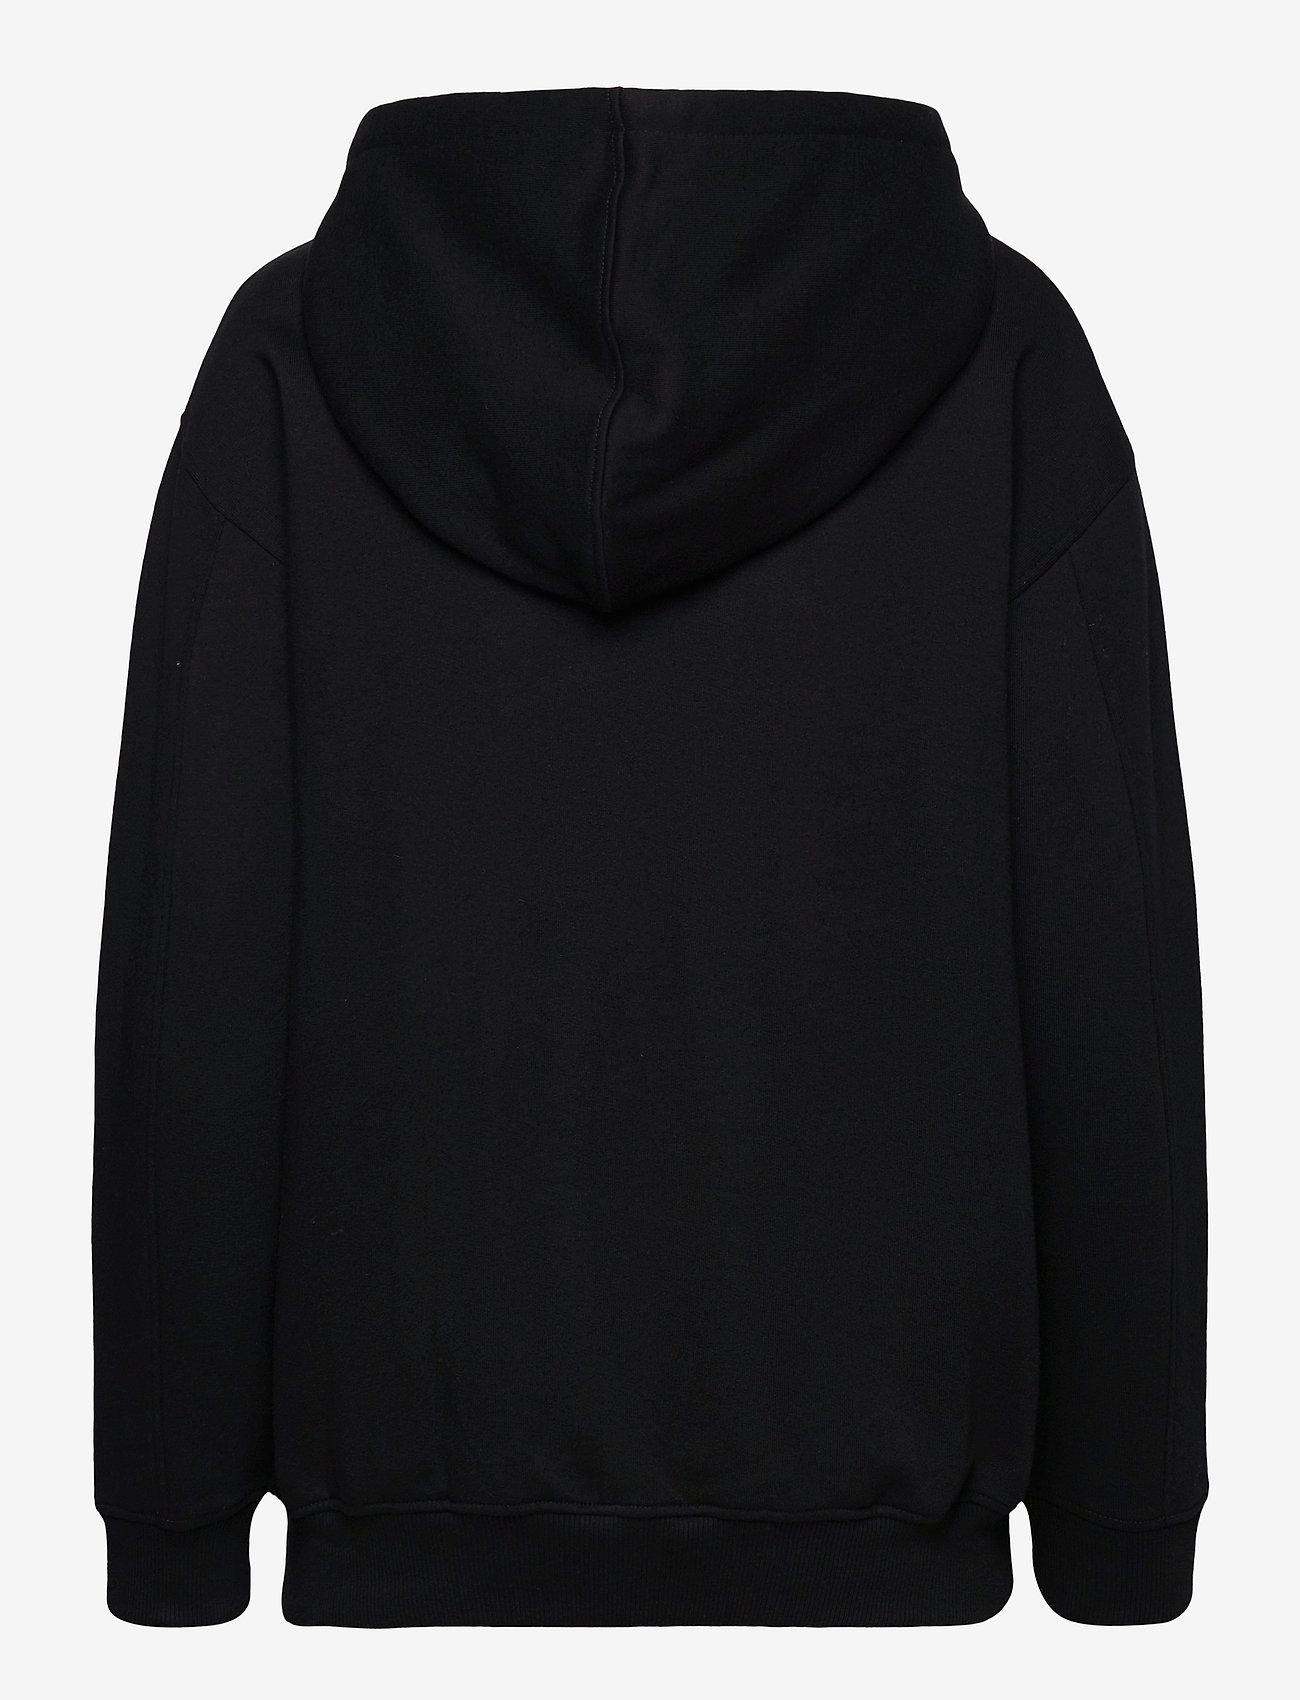 STINE GOYA - Adrisa, 1080 Hoodie - sweatshirts & hoodies - dream extreme - 2